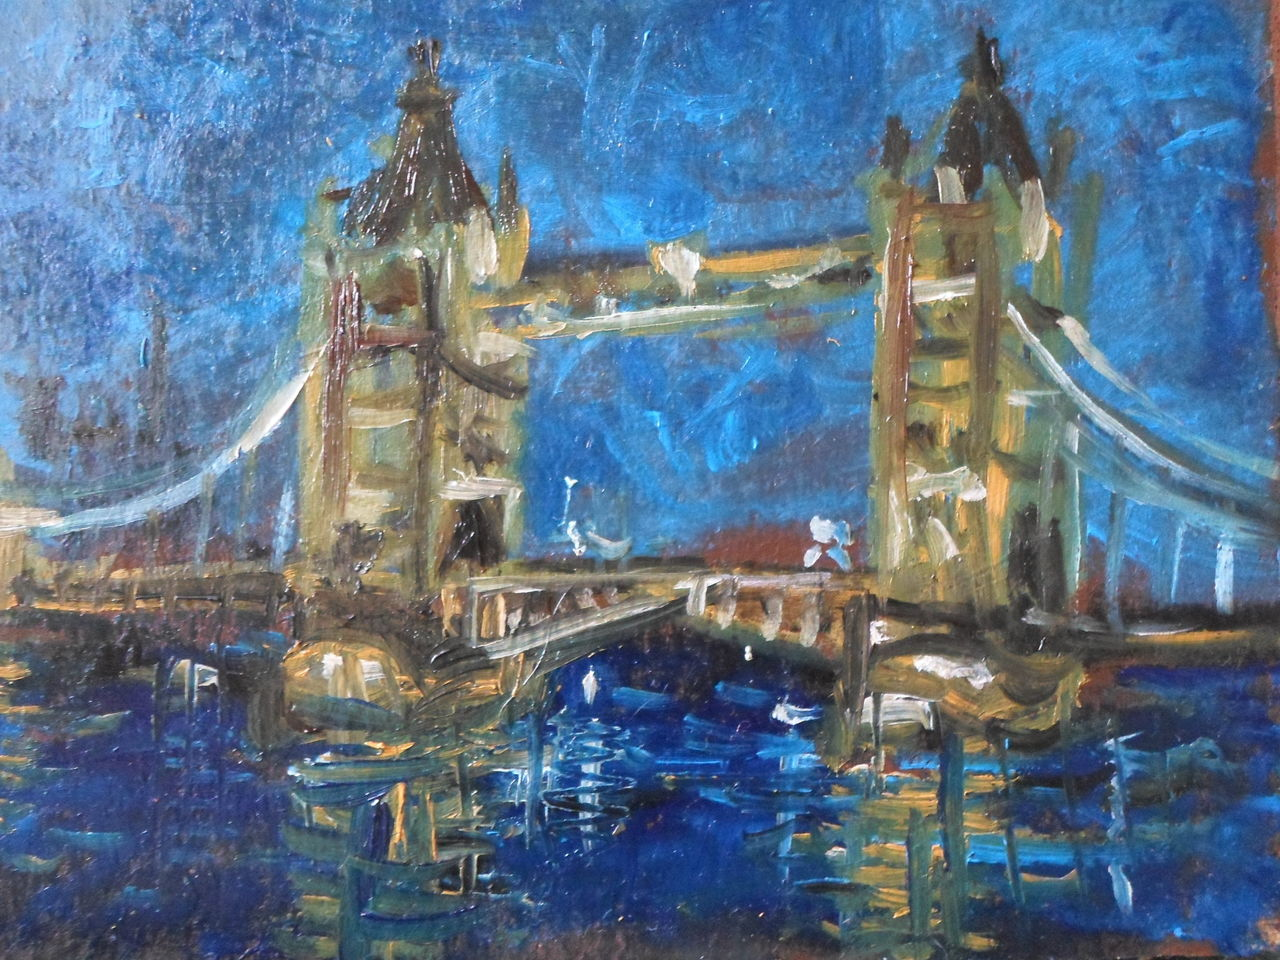 Bild london romantik br cke malerei von thies for Architektur romantik